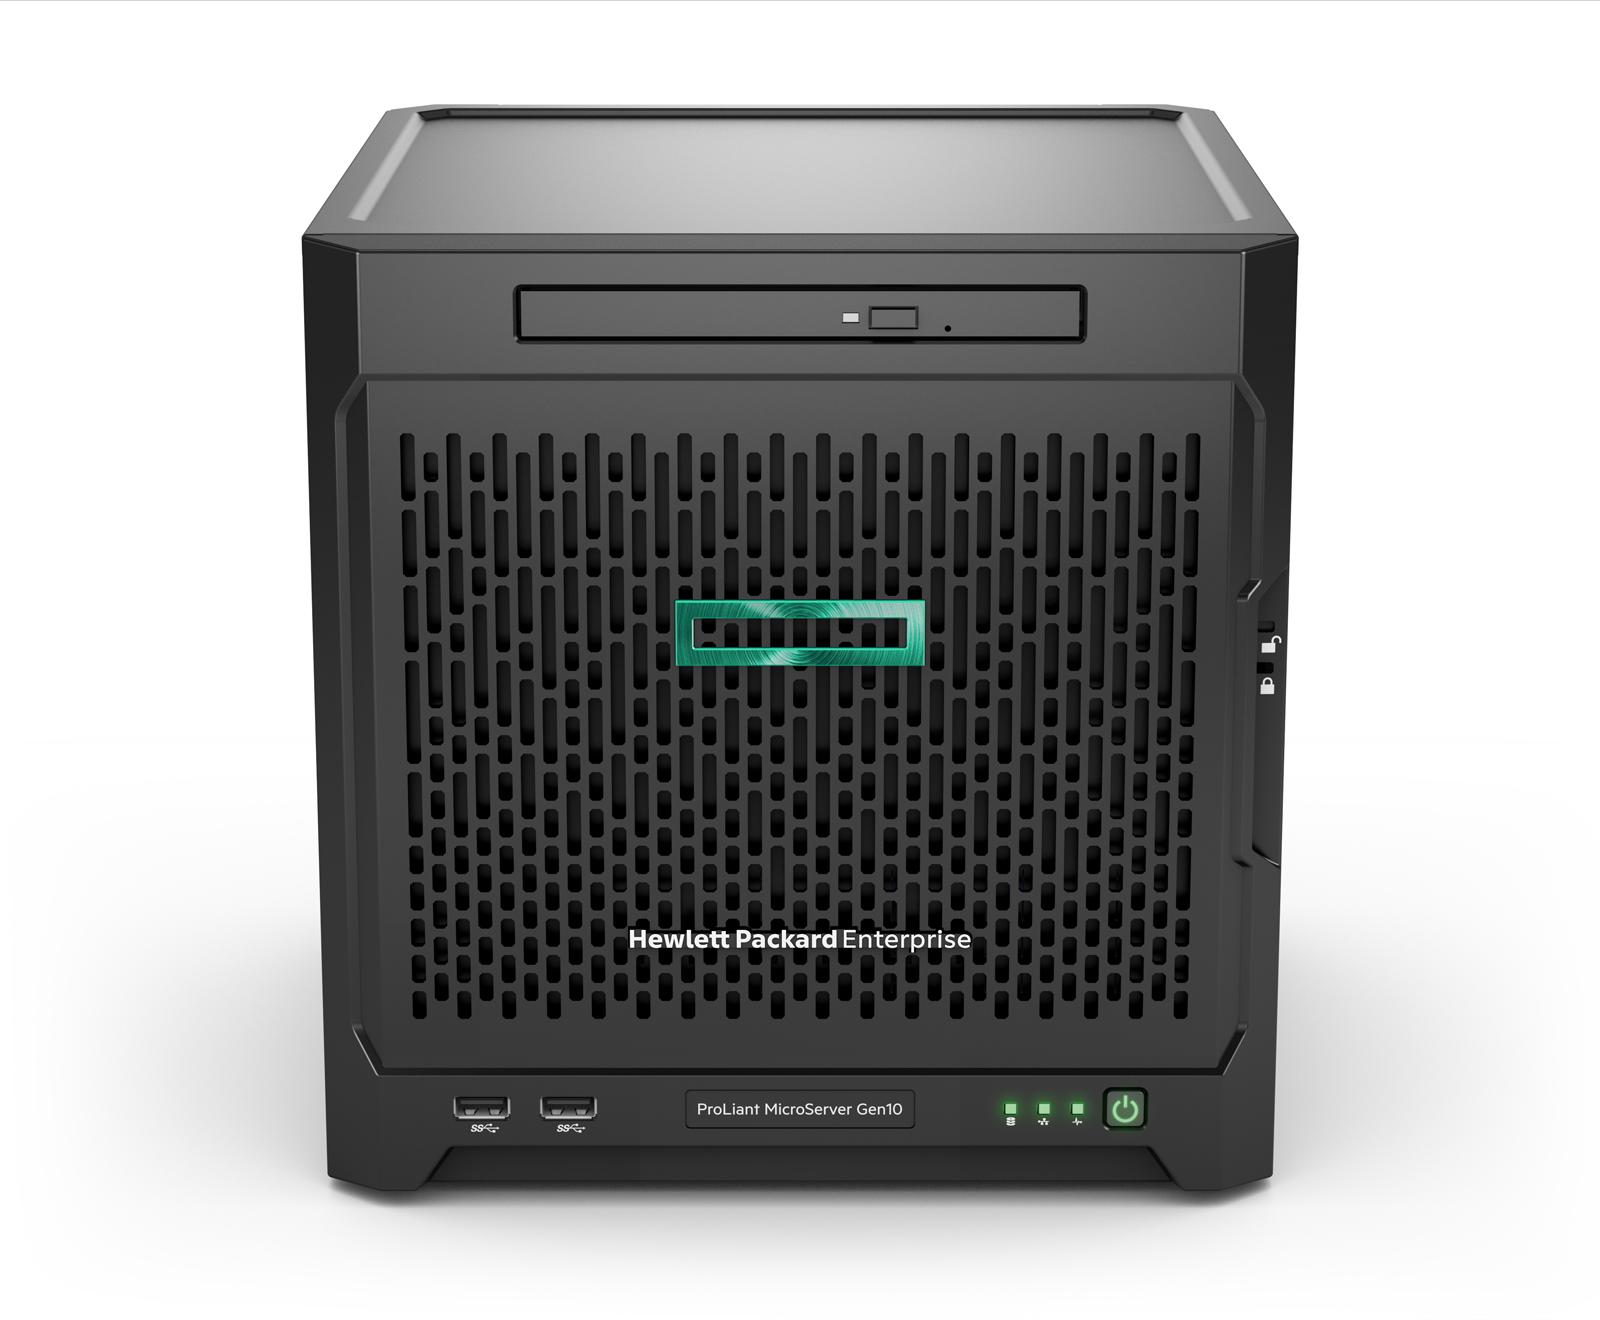 HP Enterprise ProLiant MicroServer Gen10 - 1,8 GHz - X3418 - 8 GB - DDR4-SDRAM - 200 W - Ultra Micro Tower